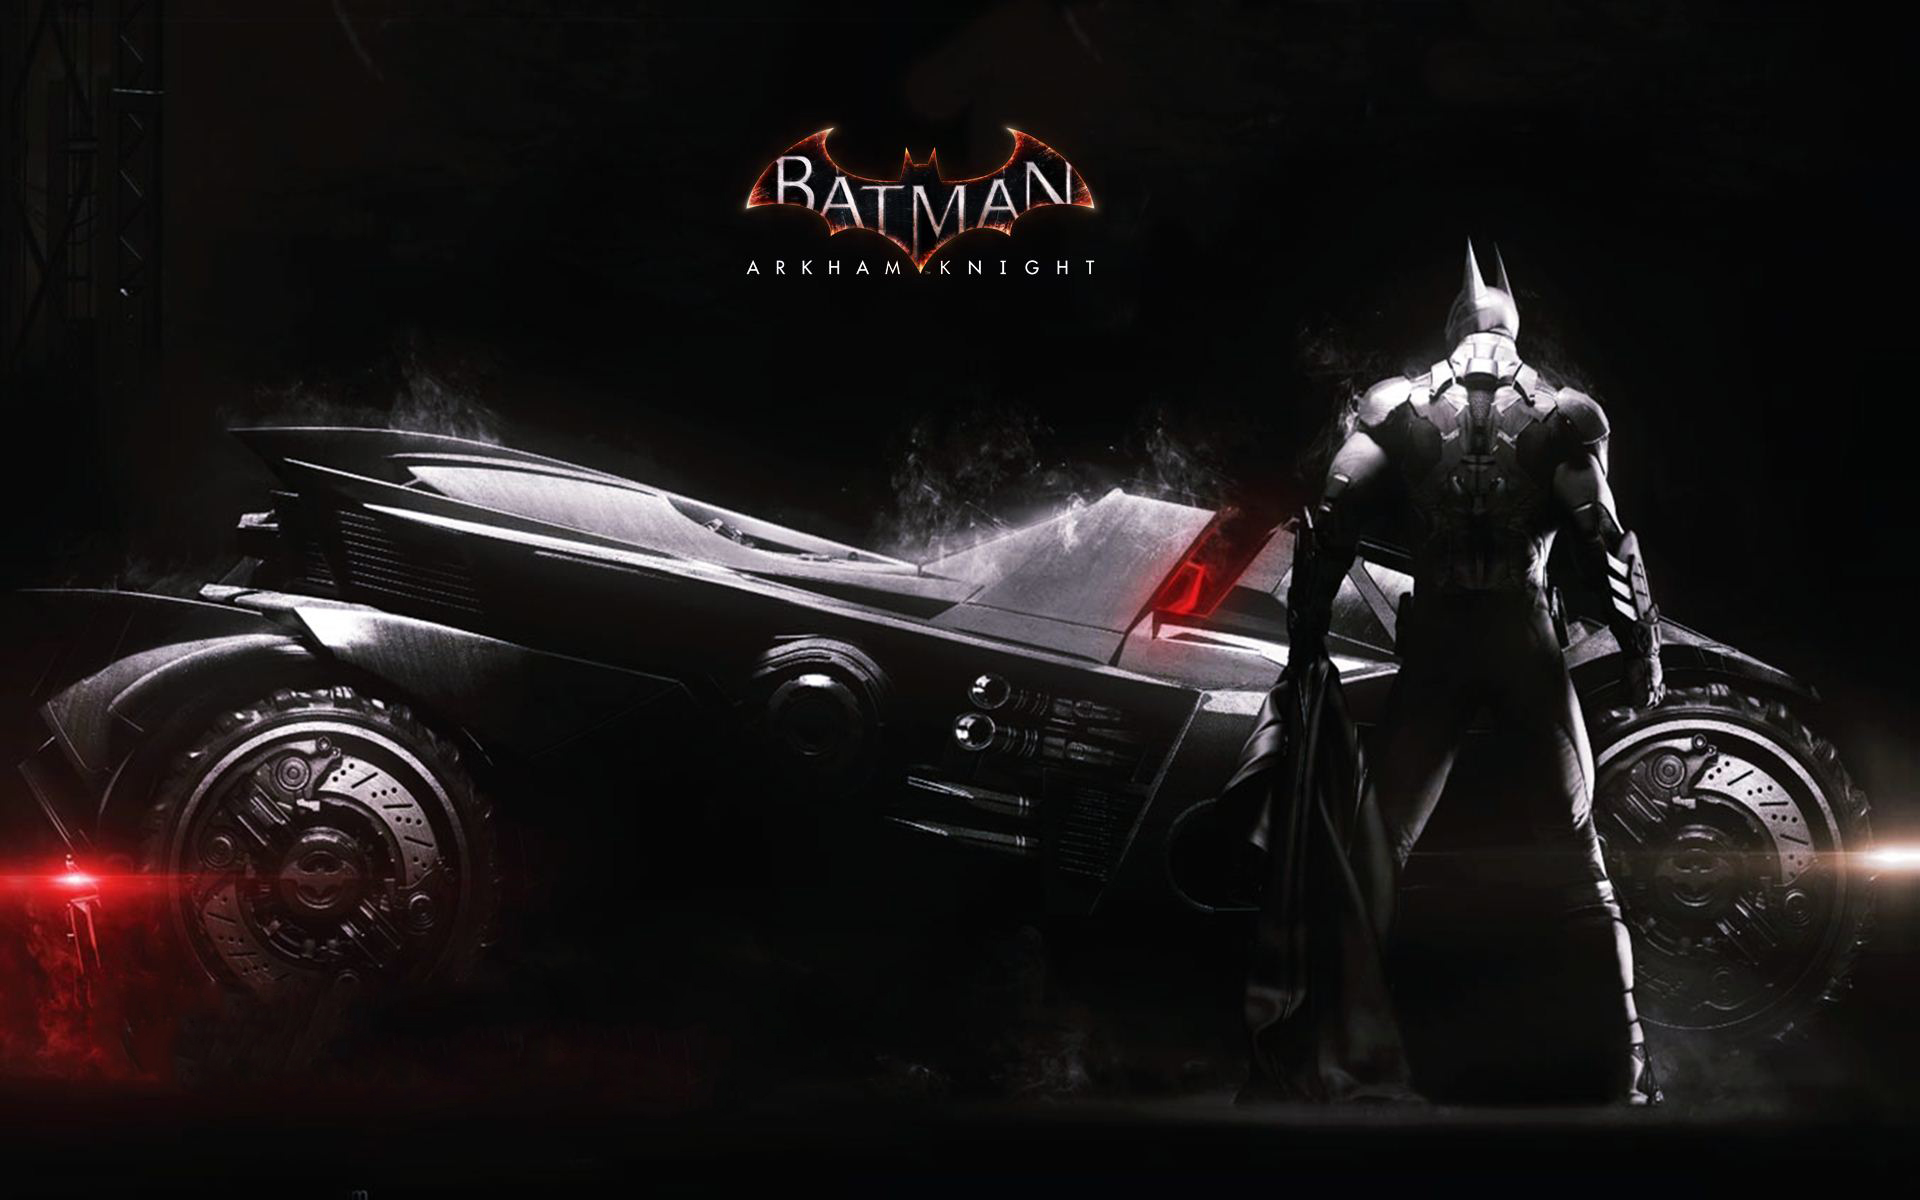 2014 Batman Arkham Knight Batmobile Exclusive HD Wallpapers 6463 1920x1200